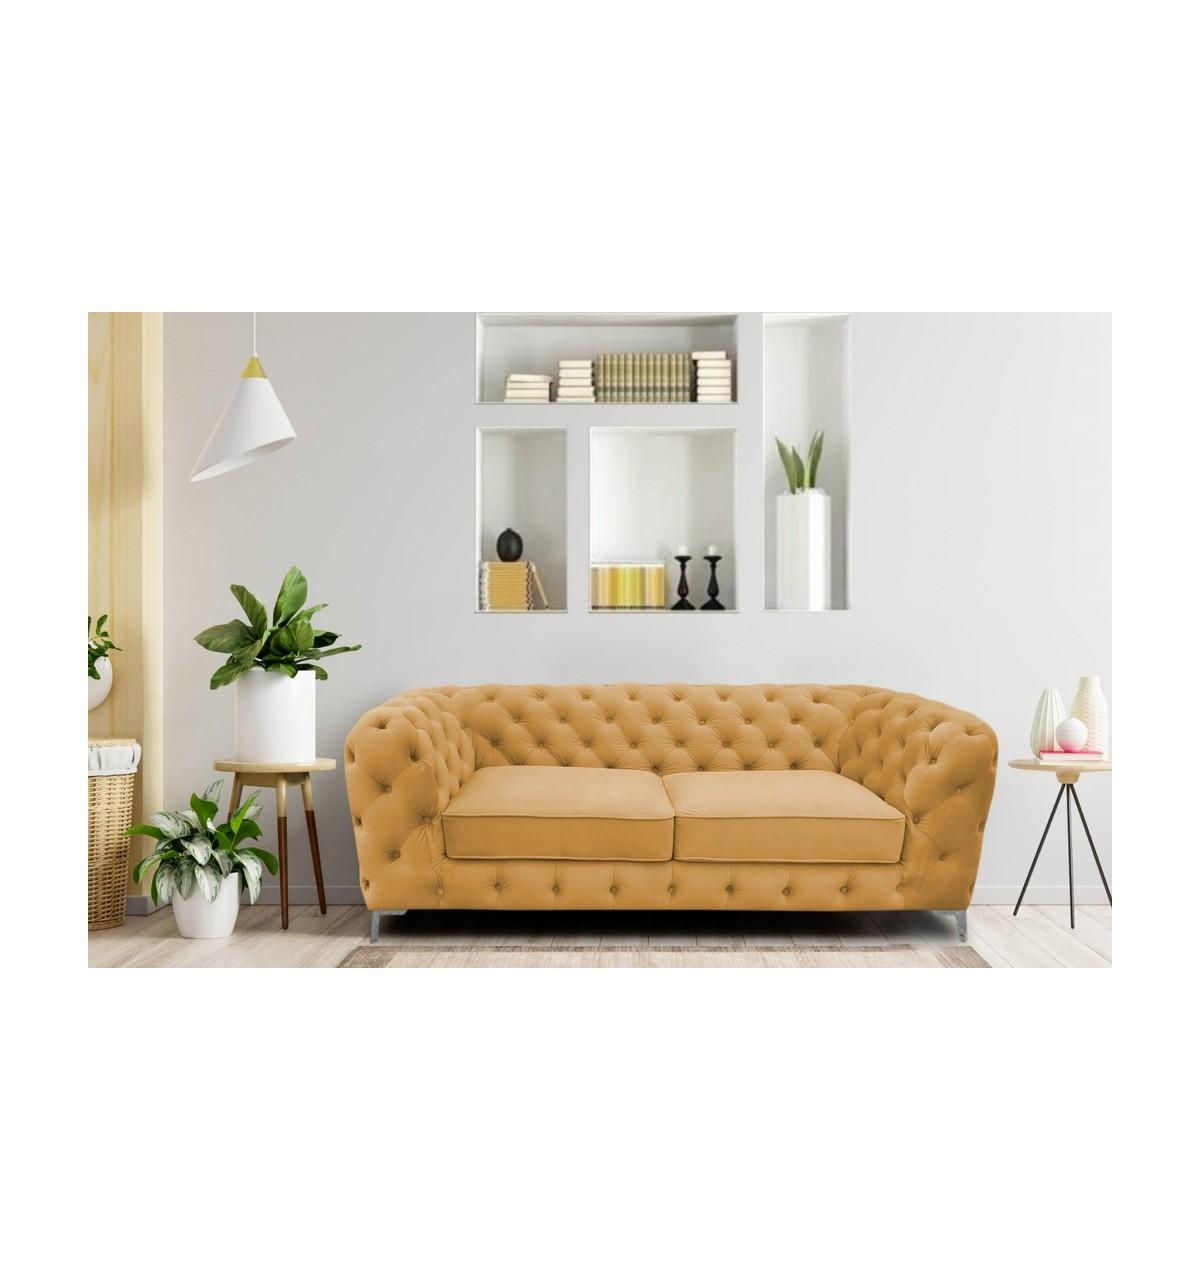 Żółta designerska kanapa